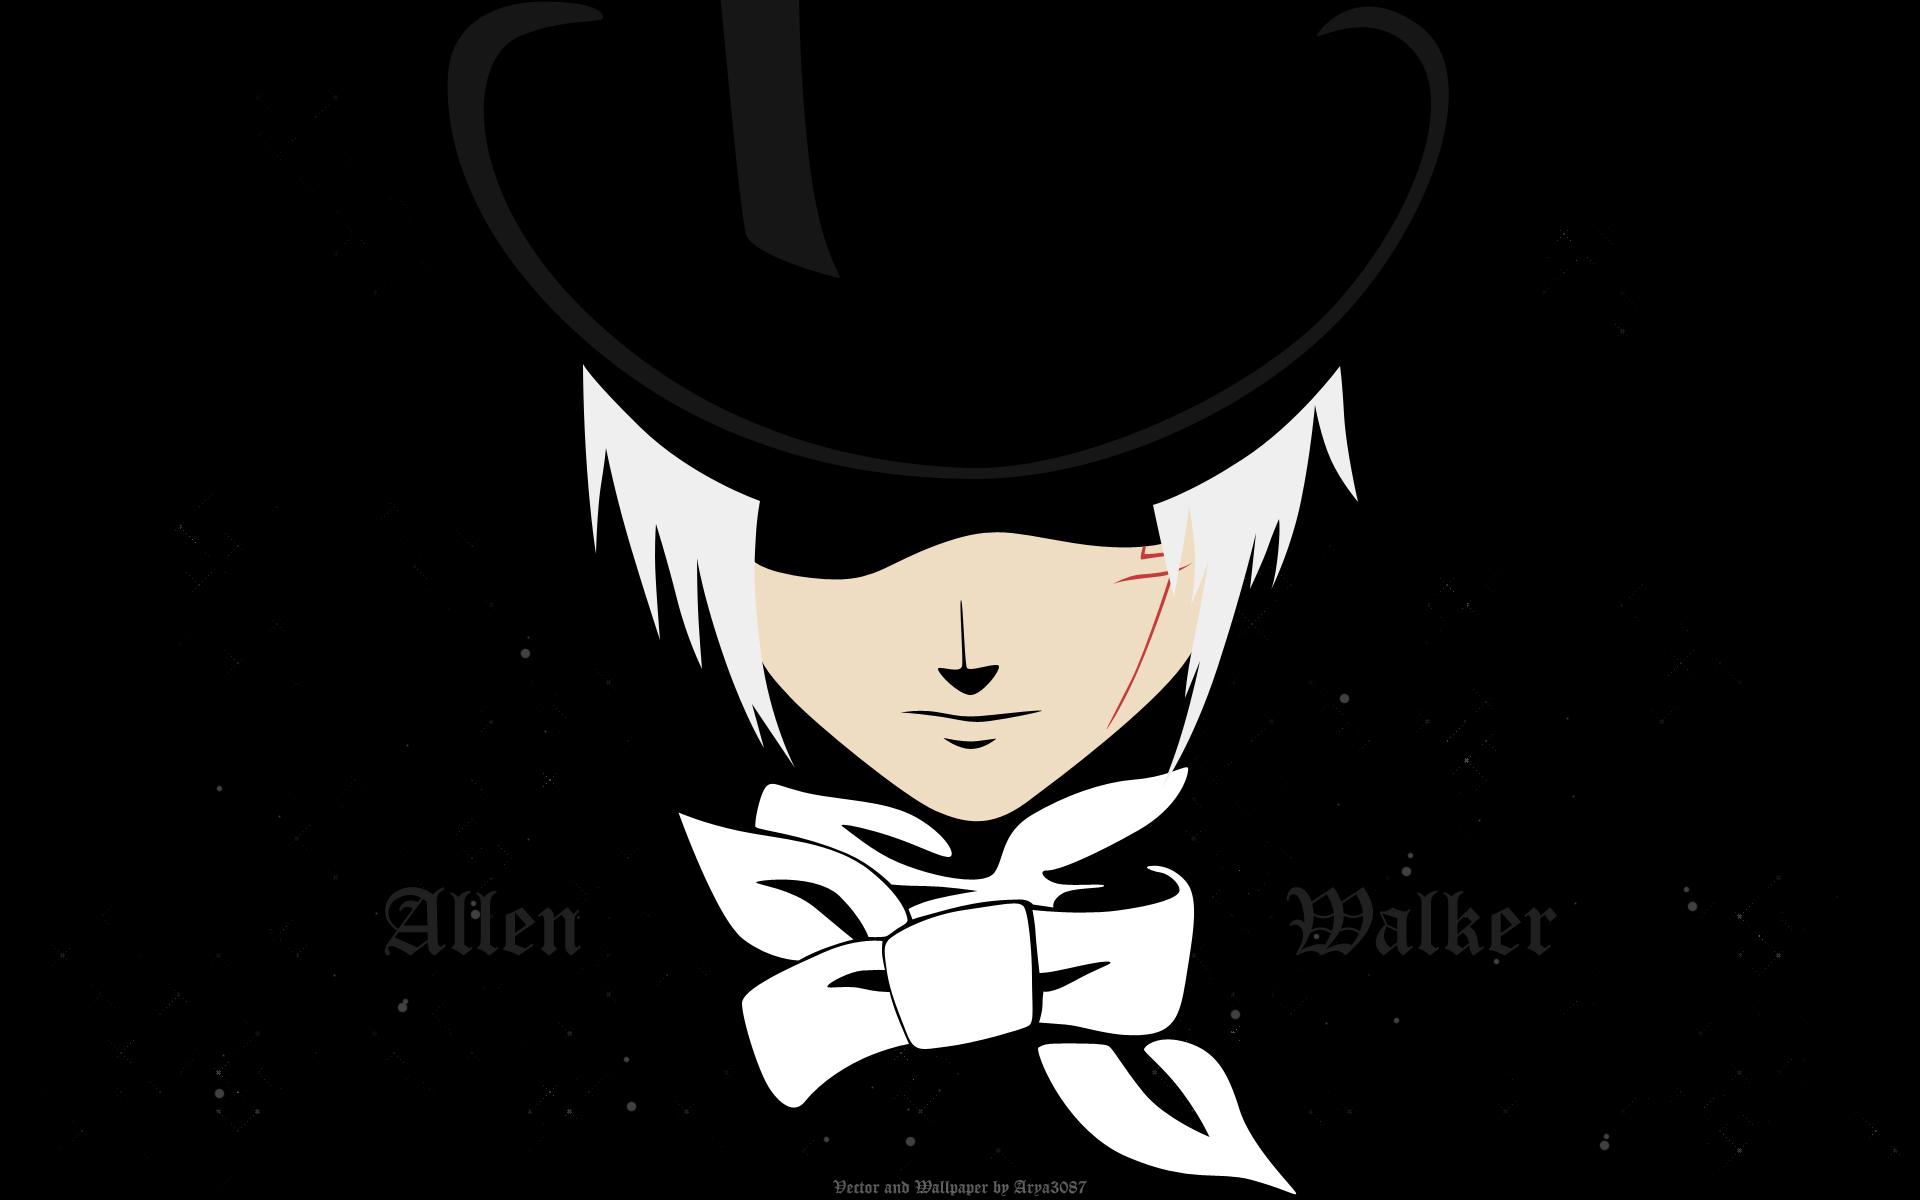 D Gray Man Volume 1 格安 北情報処のブログ